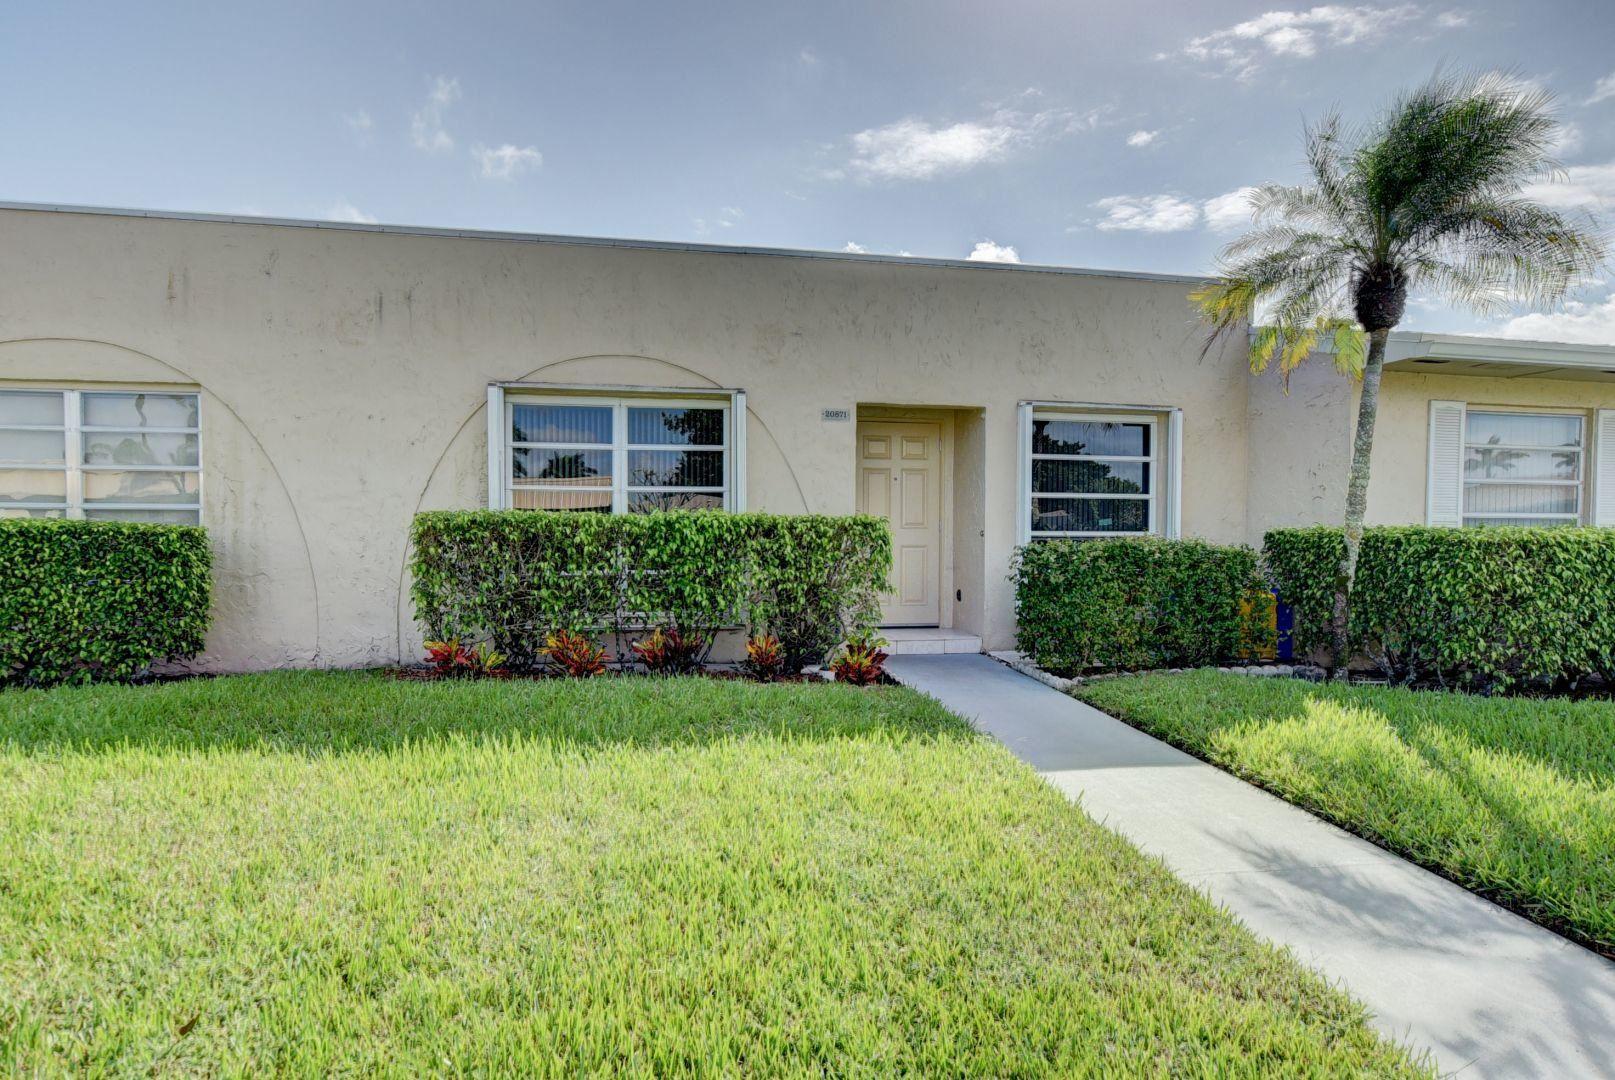 20871 Wendall Terrace, Boca Raton, FL 33433 - #: RX-10669458